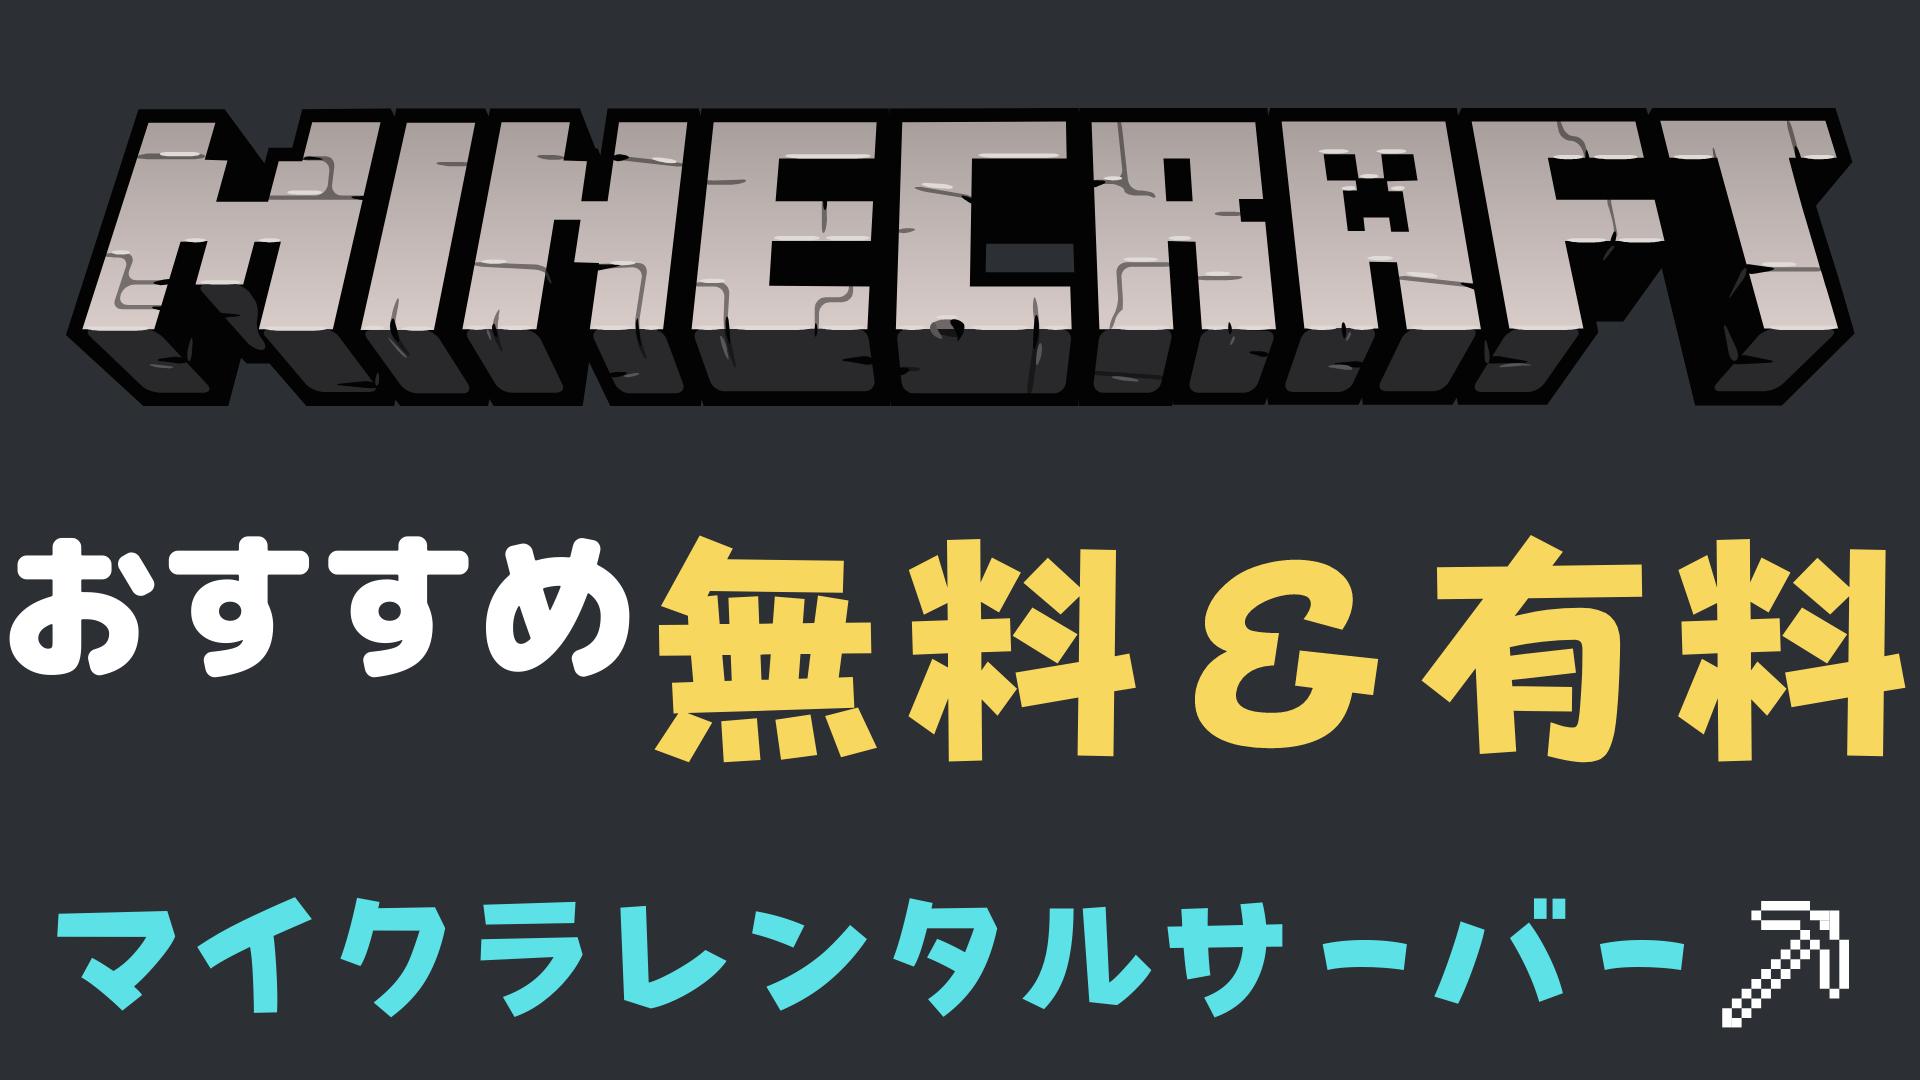 MINECRAFT おすすめ 無料&有料 マインクラフトレンタルサーバー